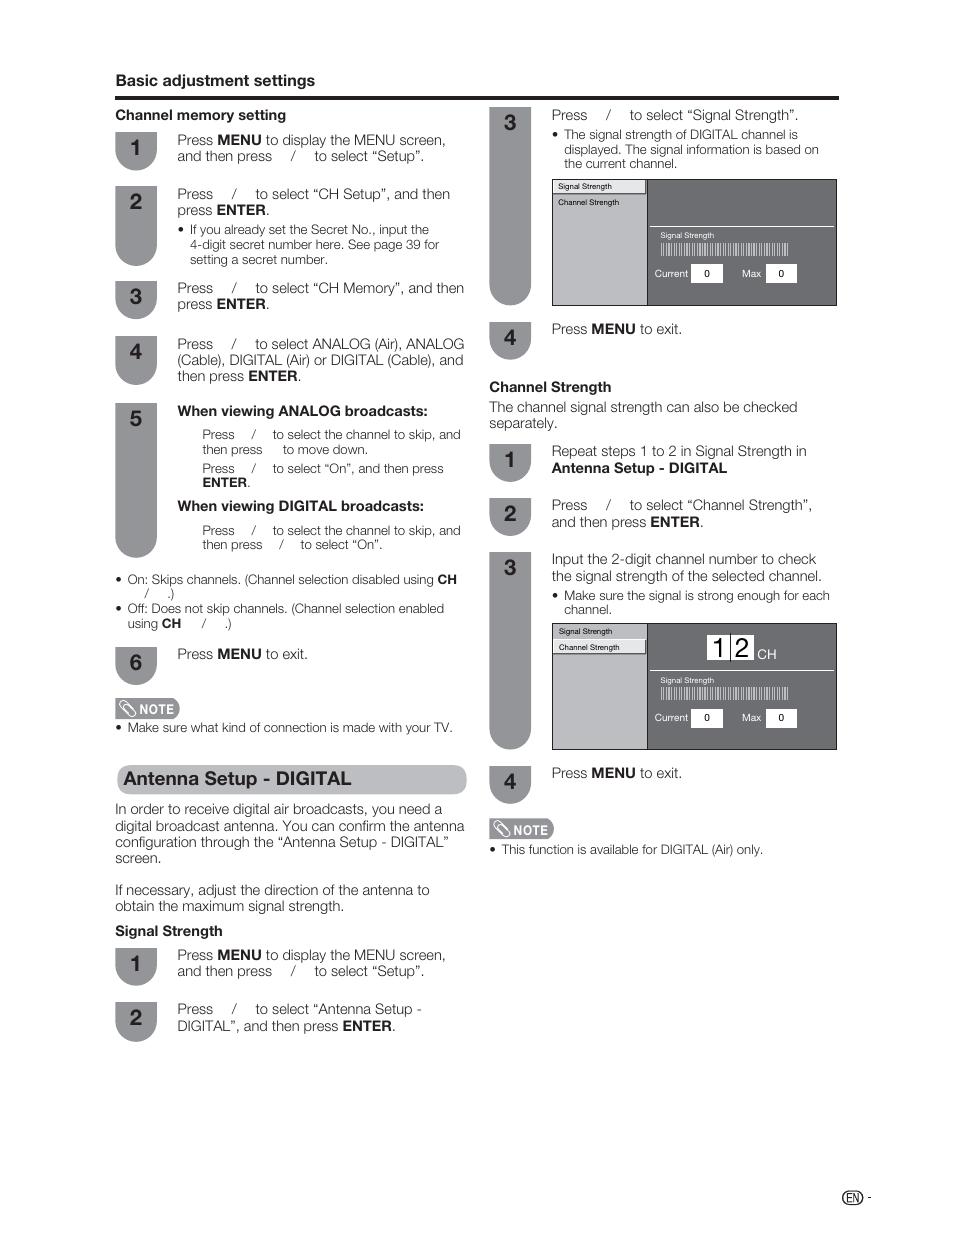 Antenna setup - digital | Sharp Aquos LC 46D62U User Manual